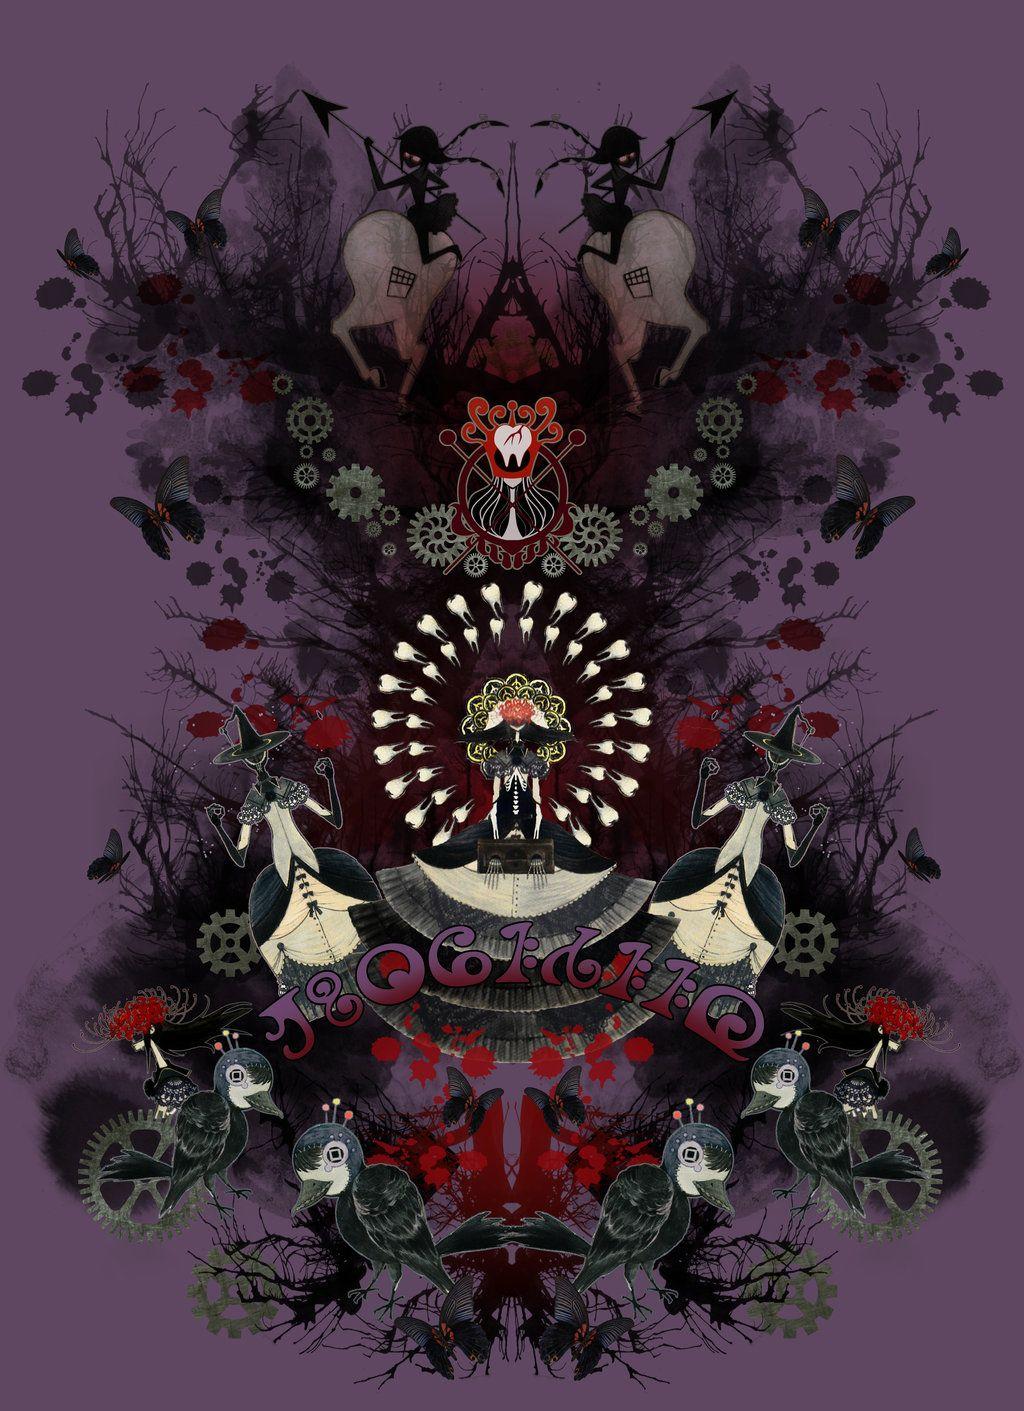 Homulilly The Nutcracker Witch Homura Akemi By Black Blossom Deviantart Com On Deviantart Madoka Magica Mahō Shōjo Madoka Magica Puella Magi Madoka Magica